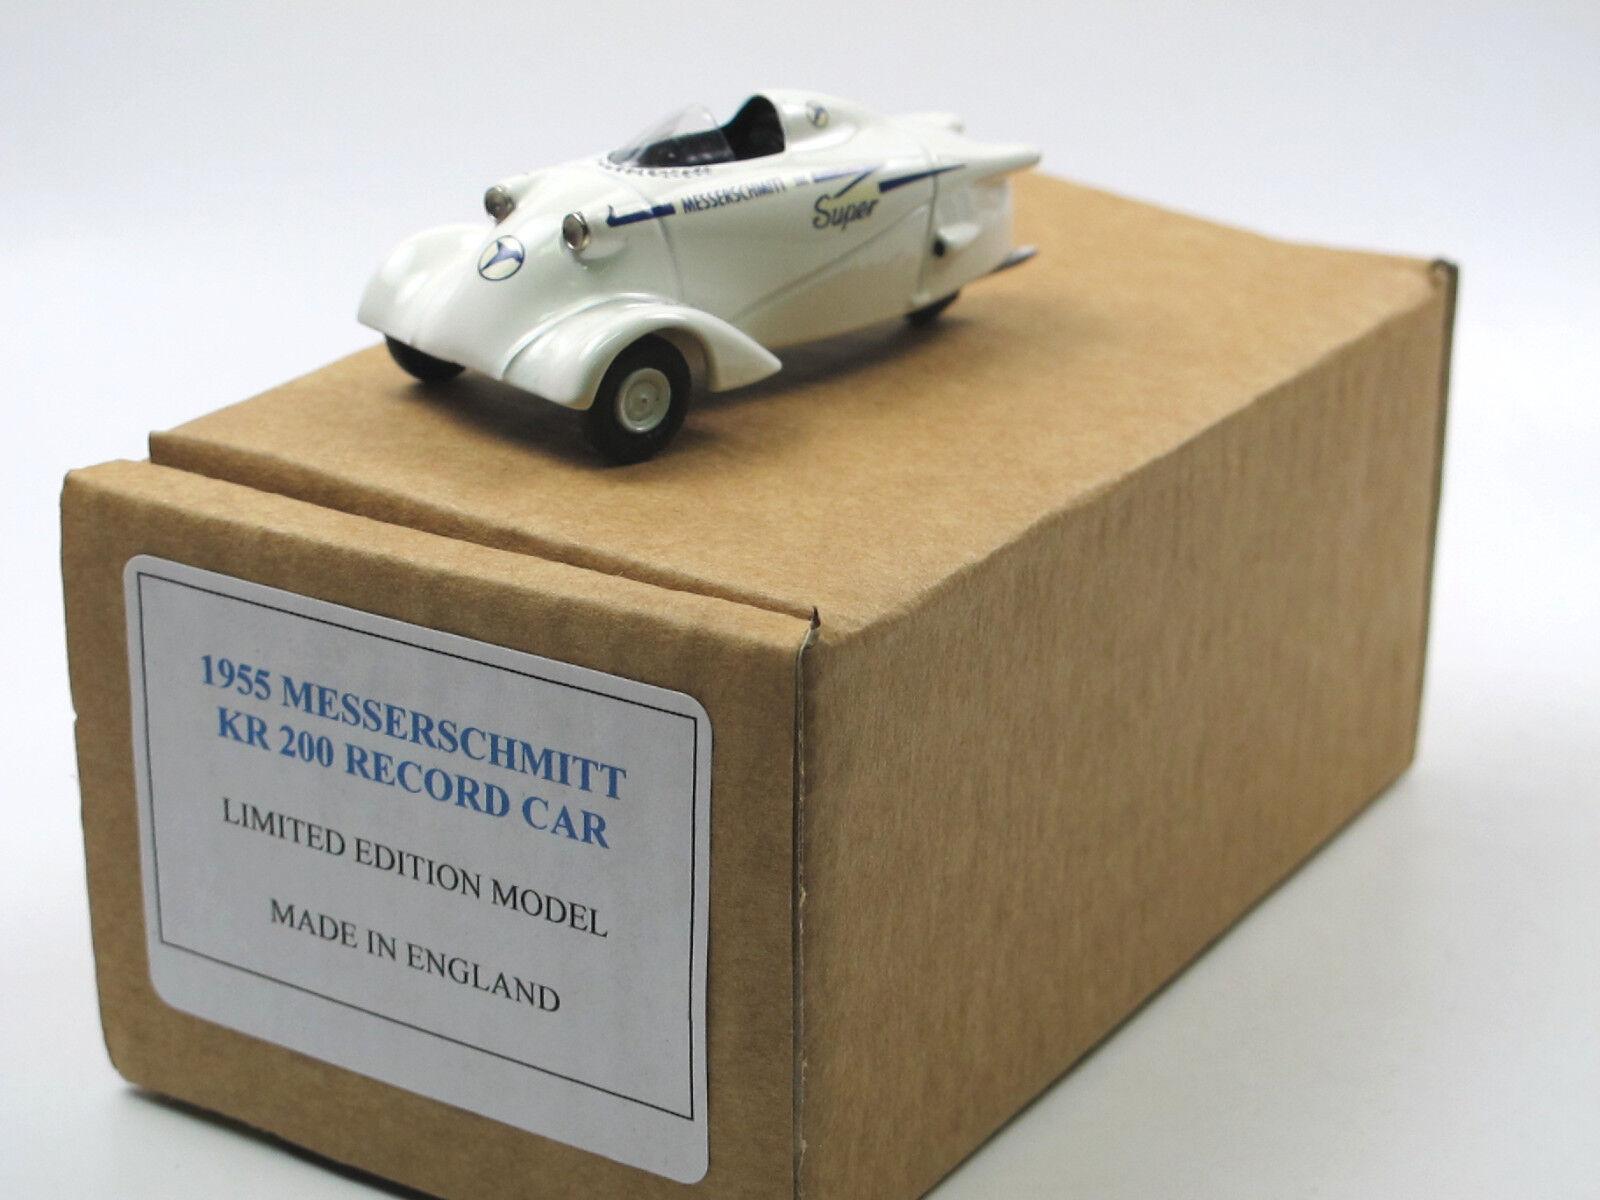 SAMS Model Cars - 1955 couteau Schmitt KR 200 record car-LSR - 1 43 blancmetall